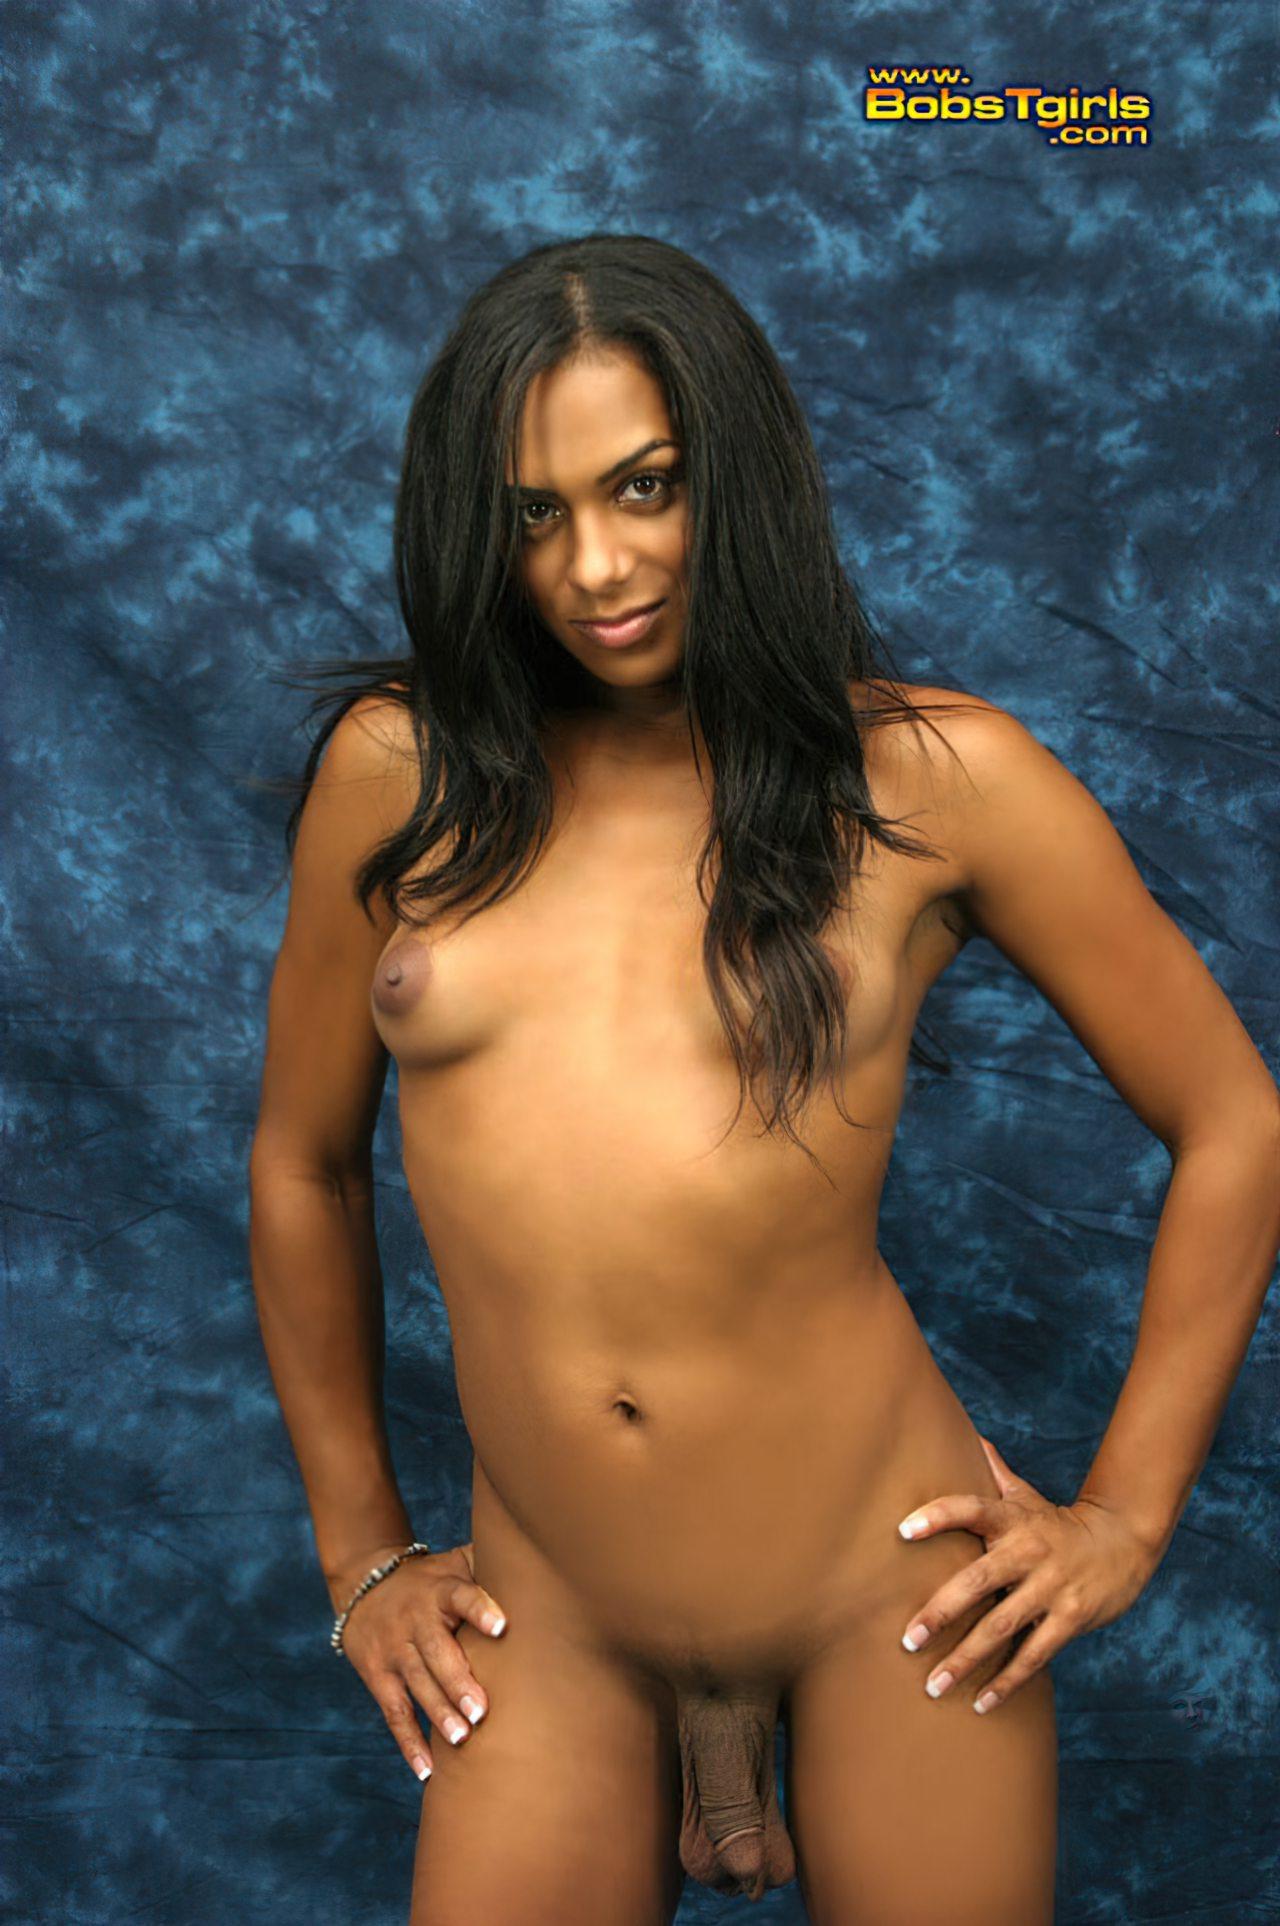 Travestis Fotos (48)